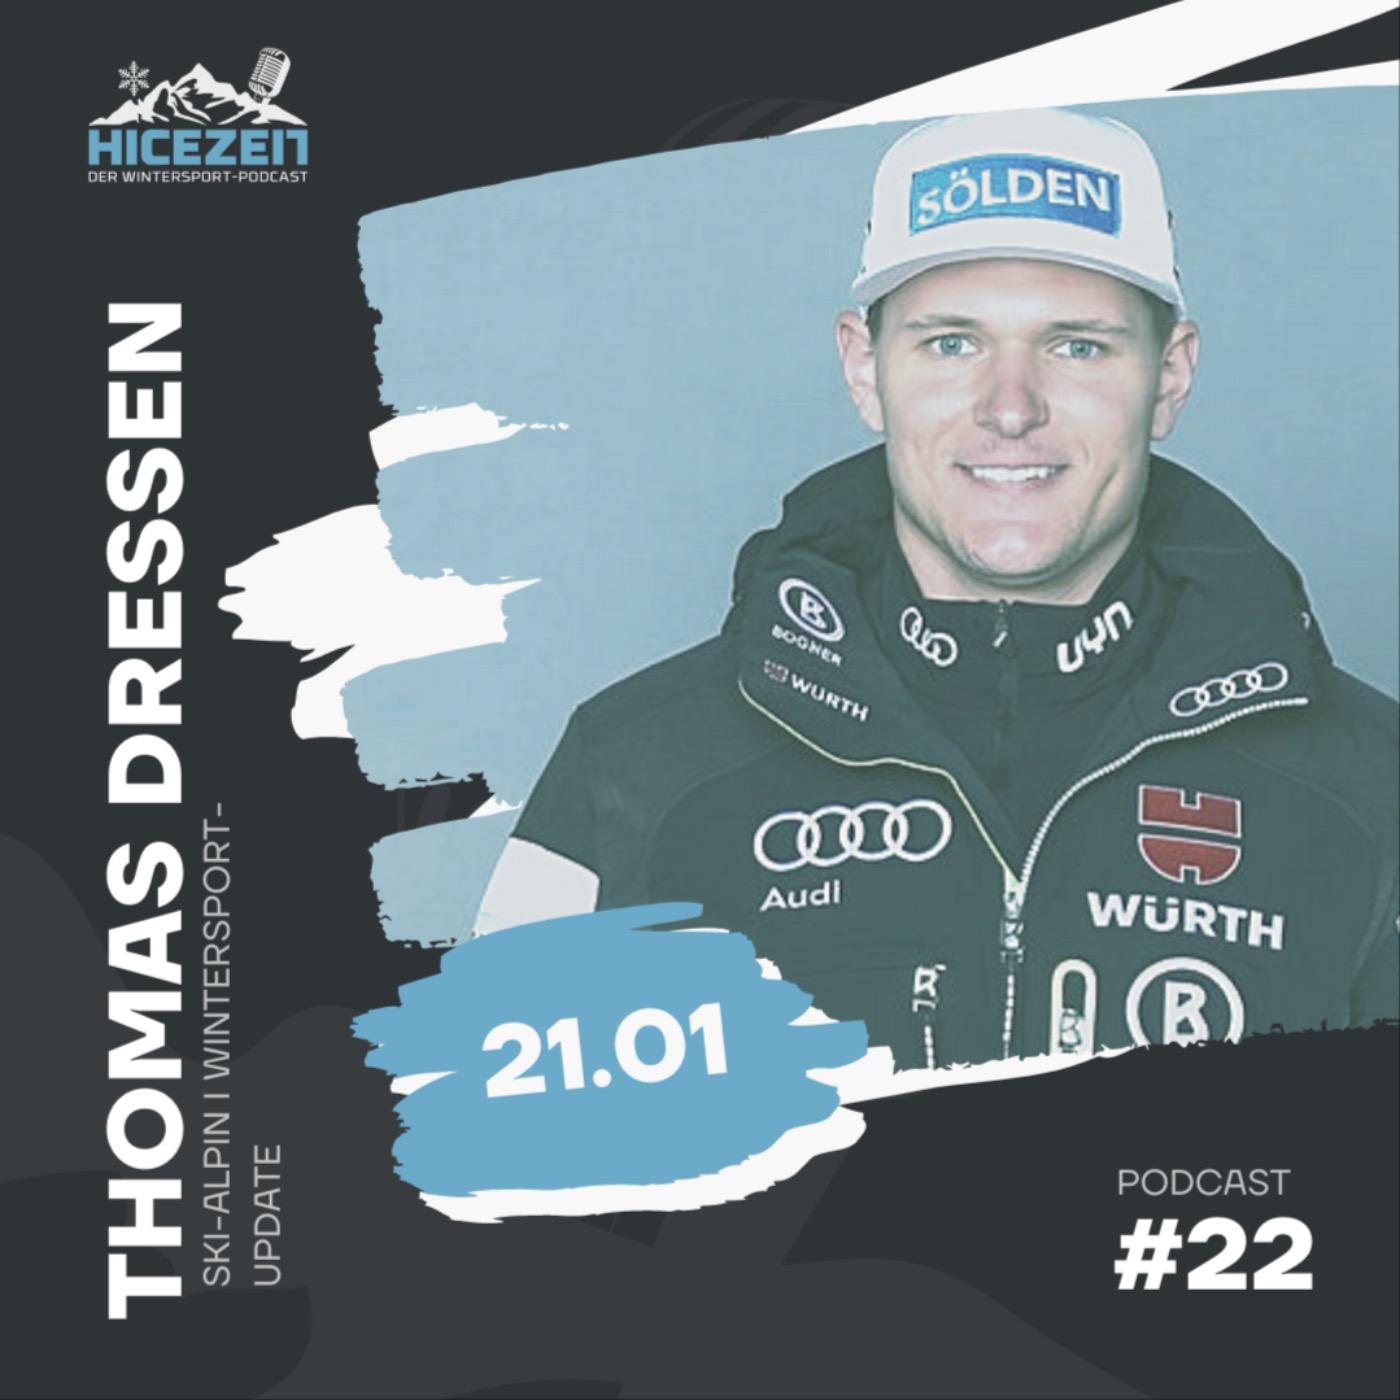 Thomas Dreßen, Ski-Alpin, Wintersport-Update, Der Wintersport-Podcast Folge 22